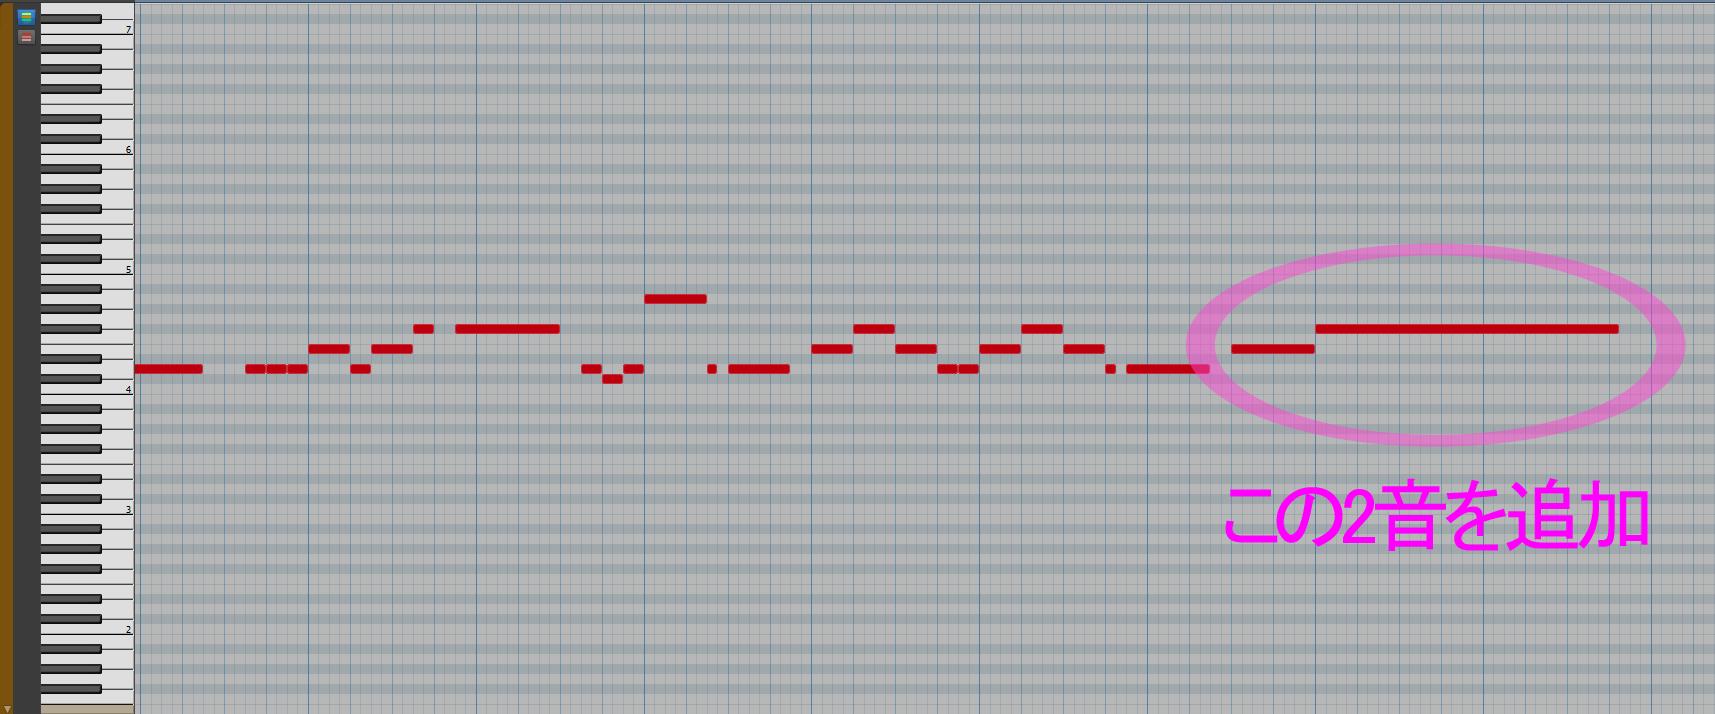 jk_melody_midi_4_tx